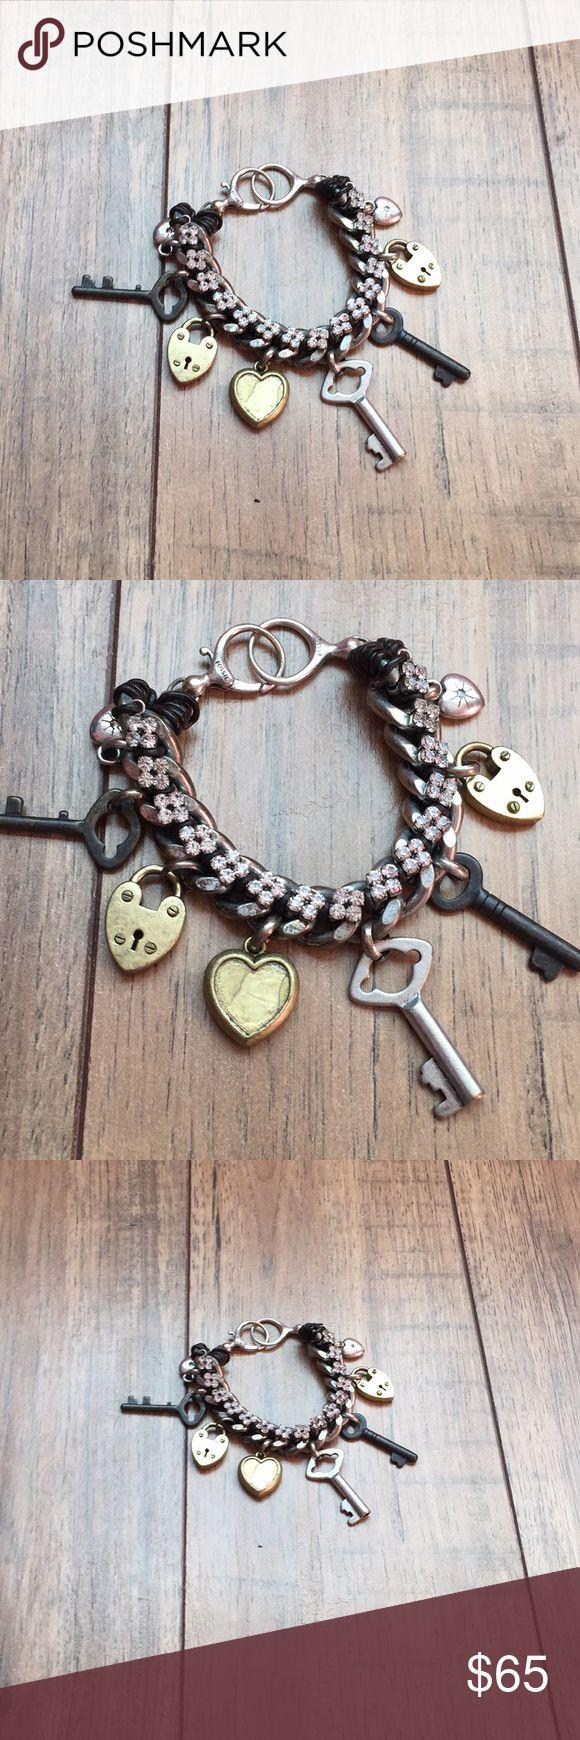 Fossil bracelet Fossil Bracelet Fossil Jewelry Bracelets